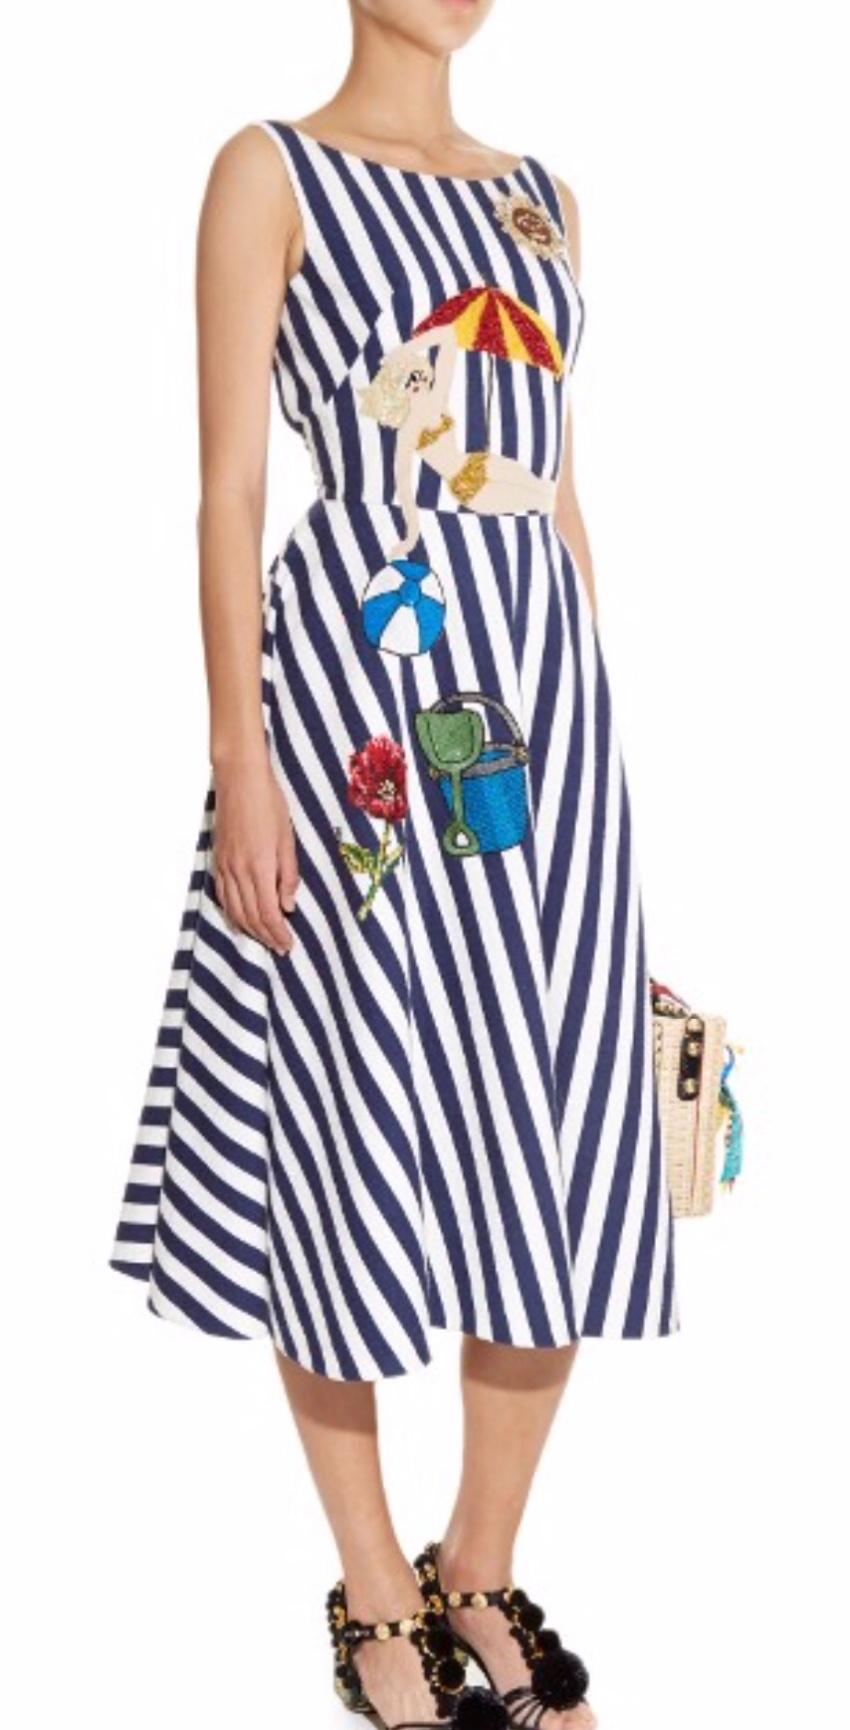 Dolce & Gabbana striped summer dress